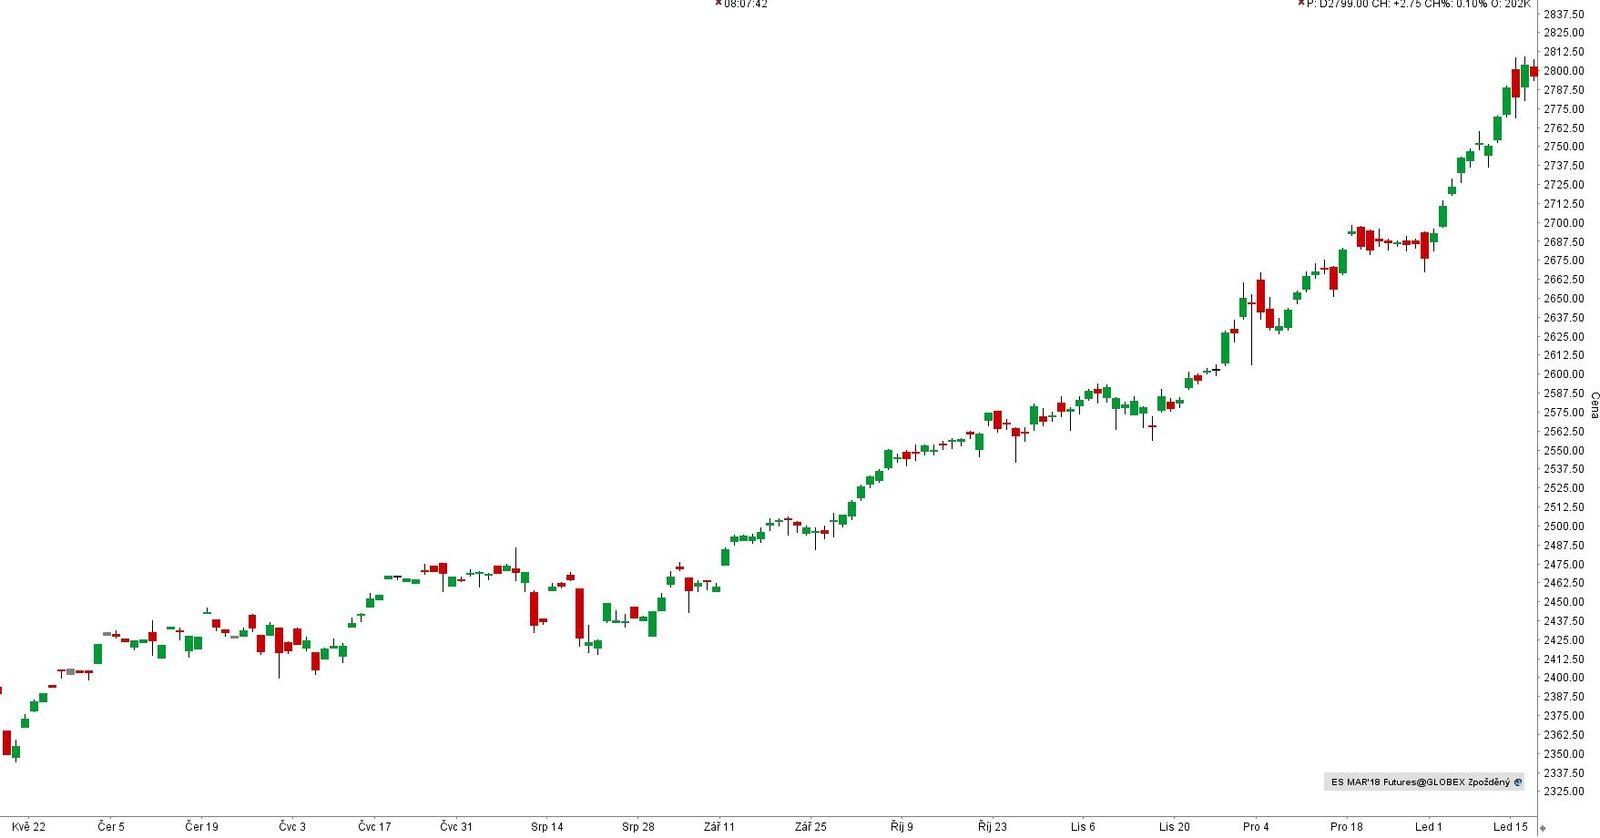 Futures na SP 500 - denní graf